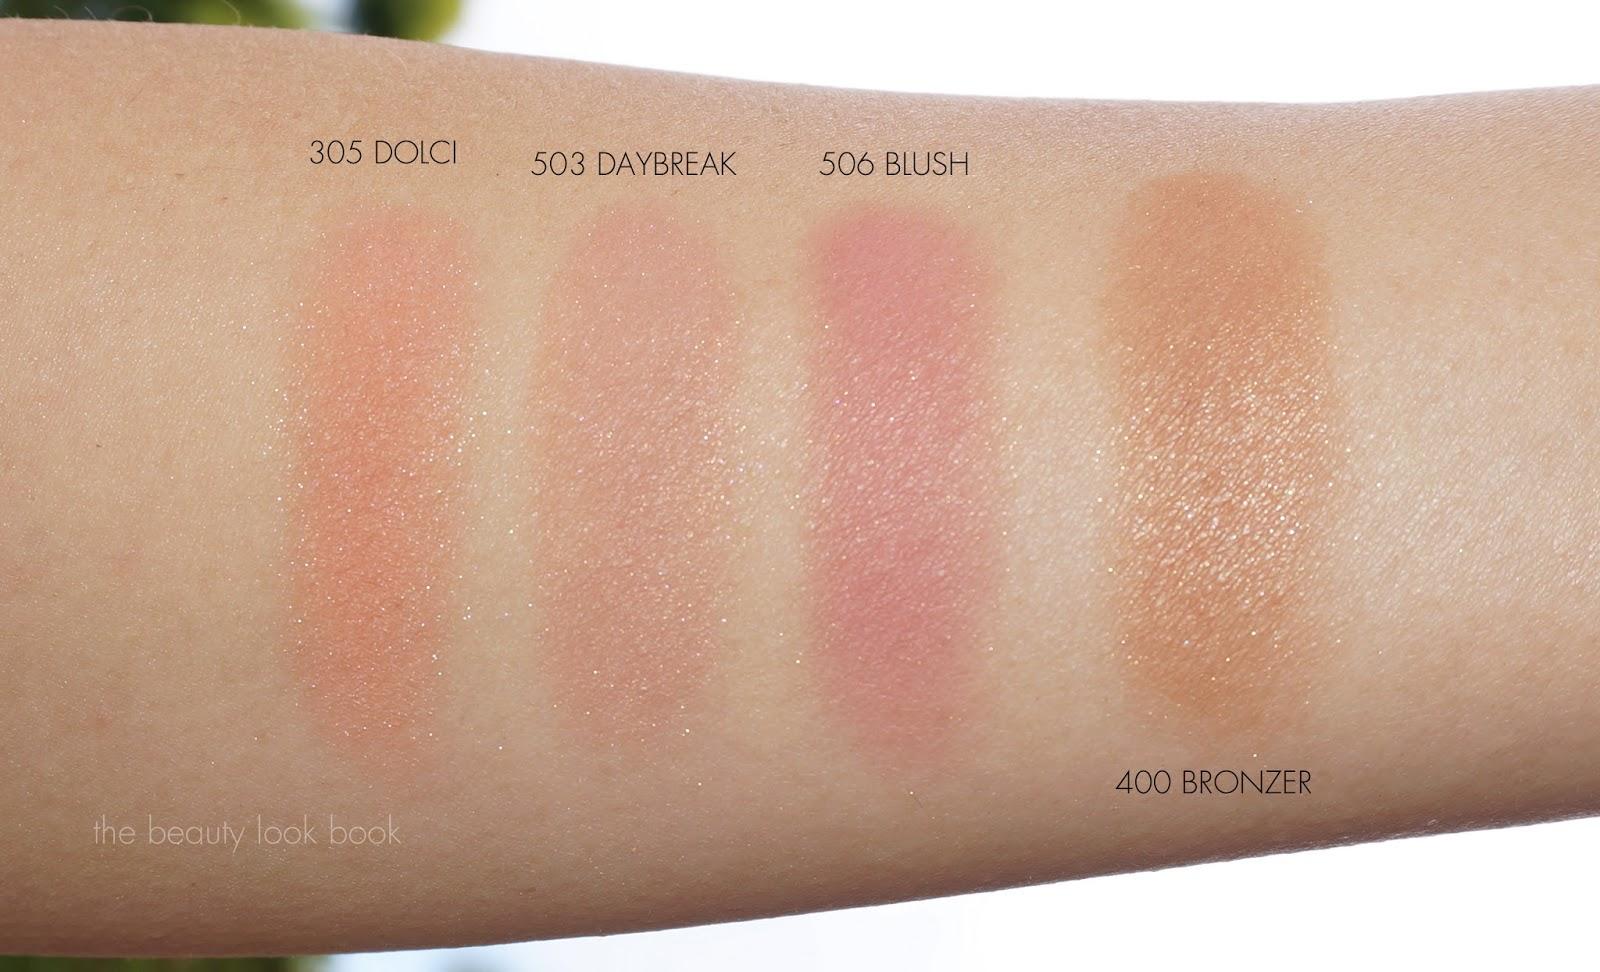 Blush Color Swatch